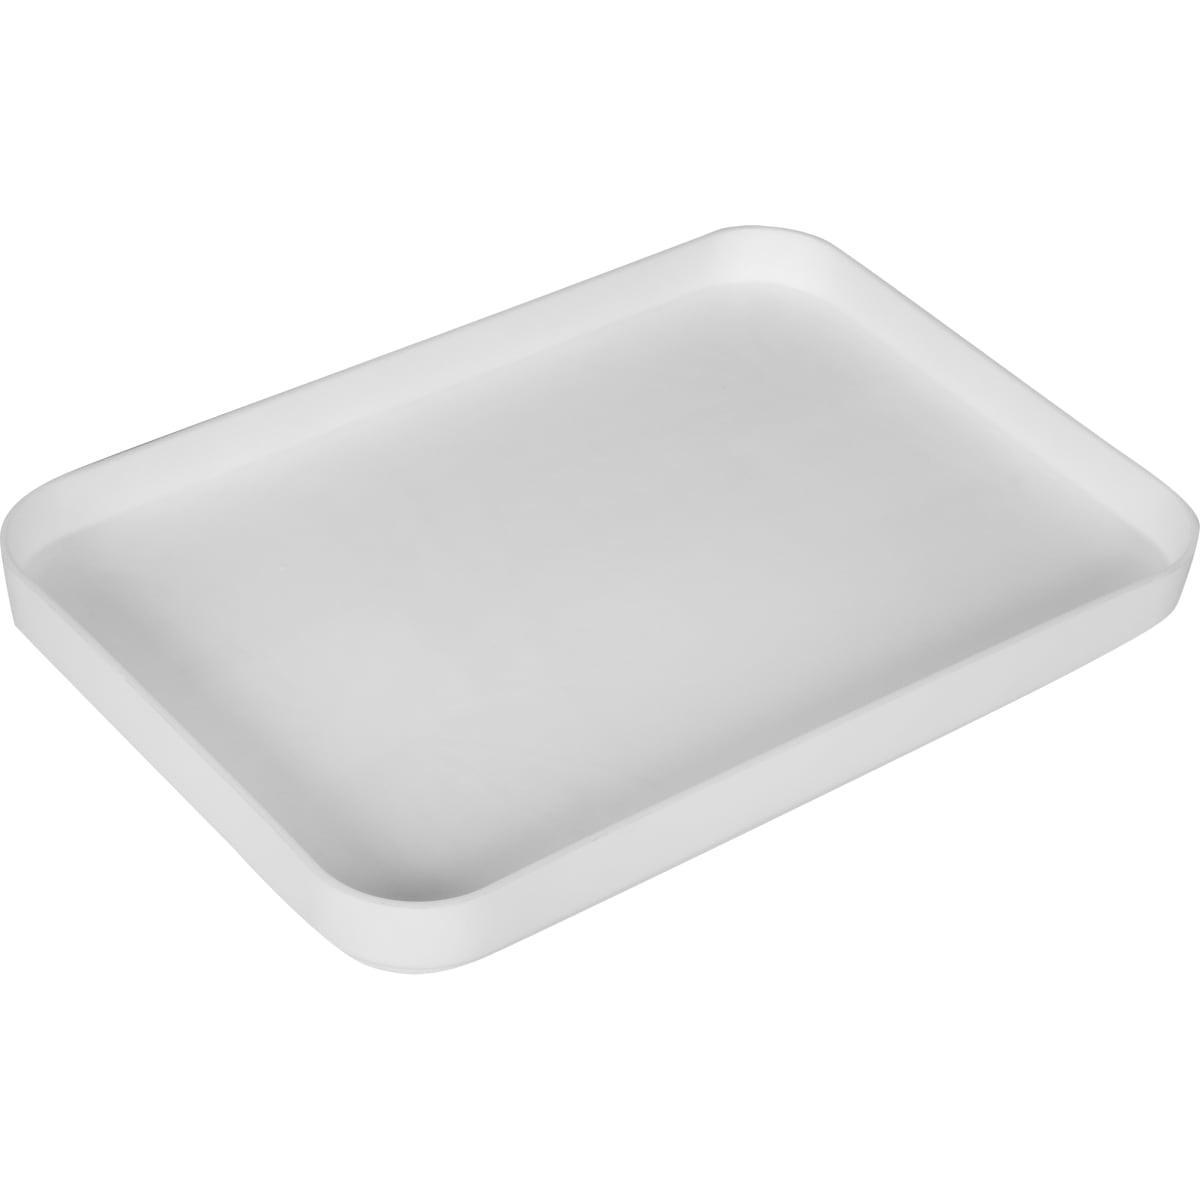 Крышка большая, 158x21x228 мм, пластик, цвет белый